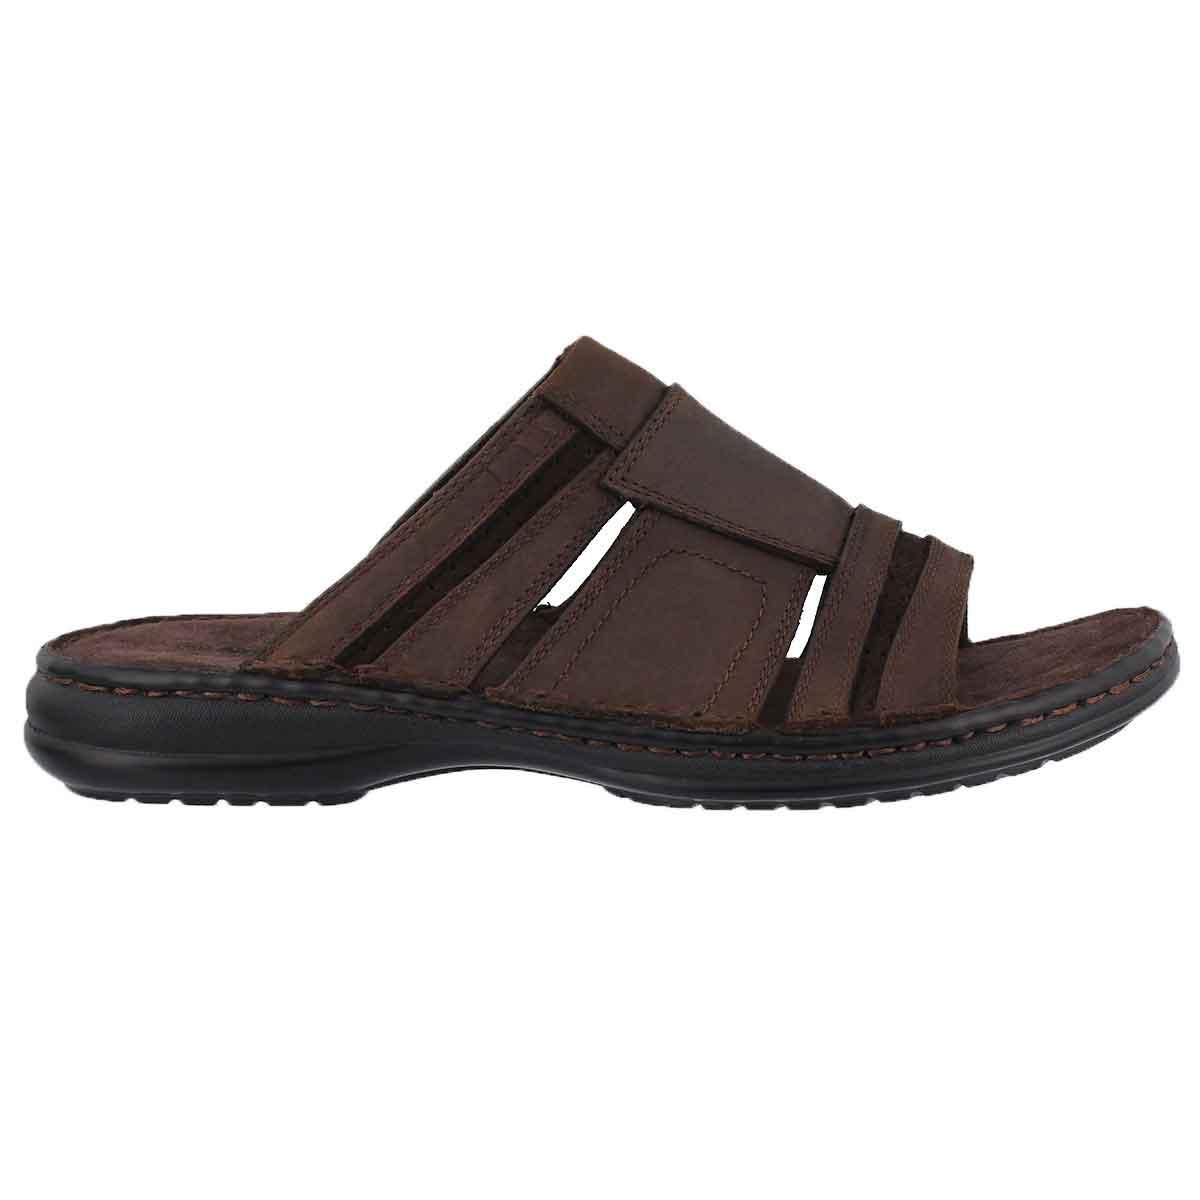 Mns Khal brown casual slide sandal